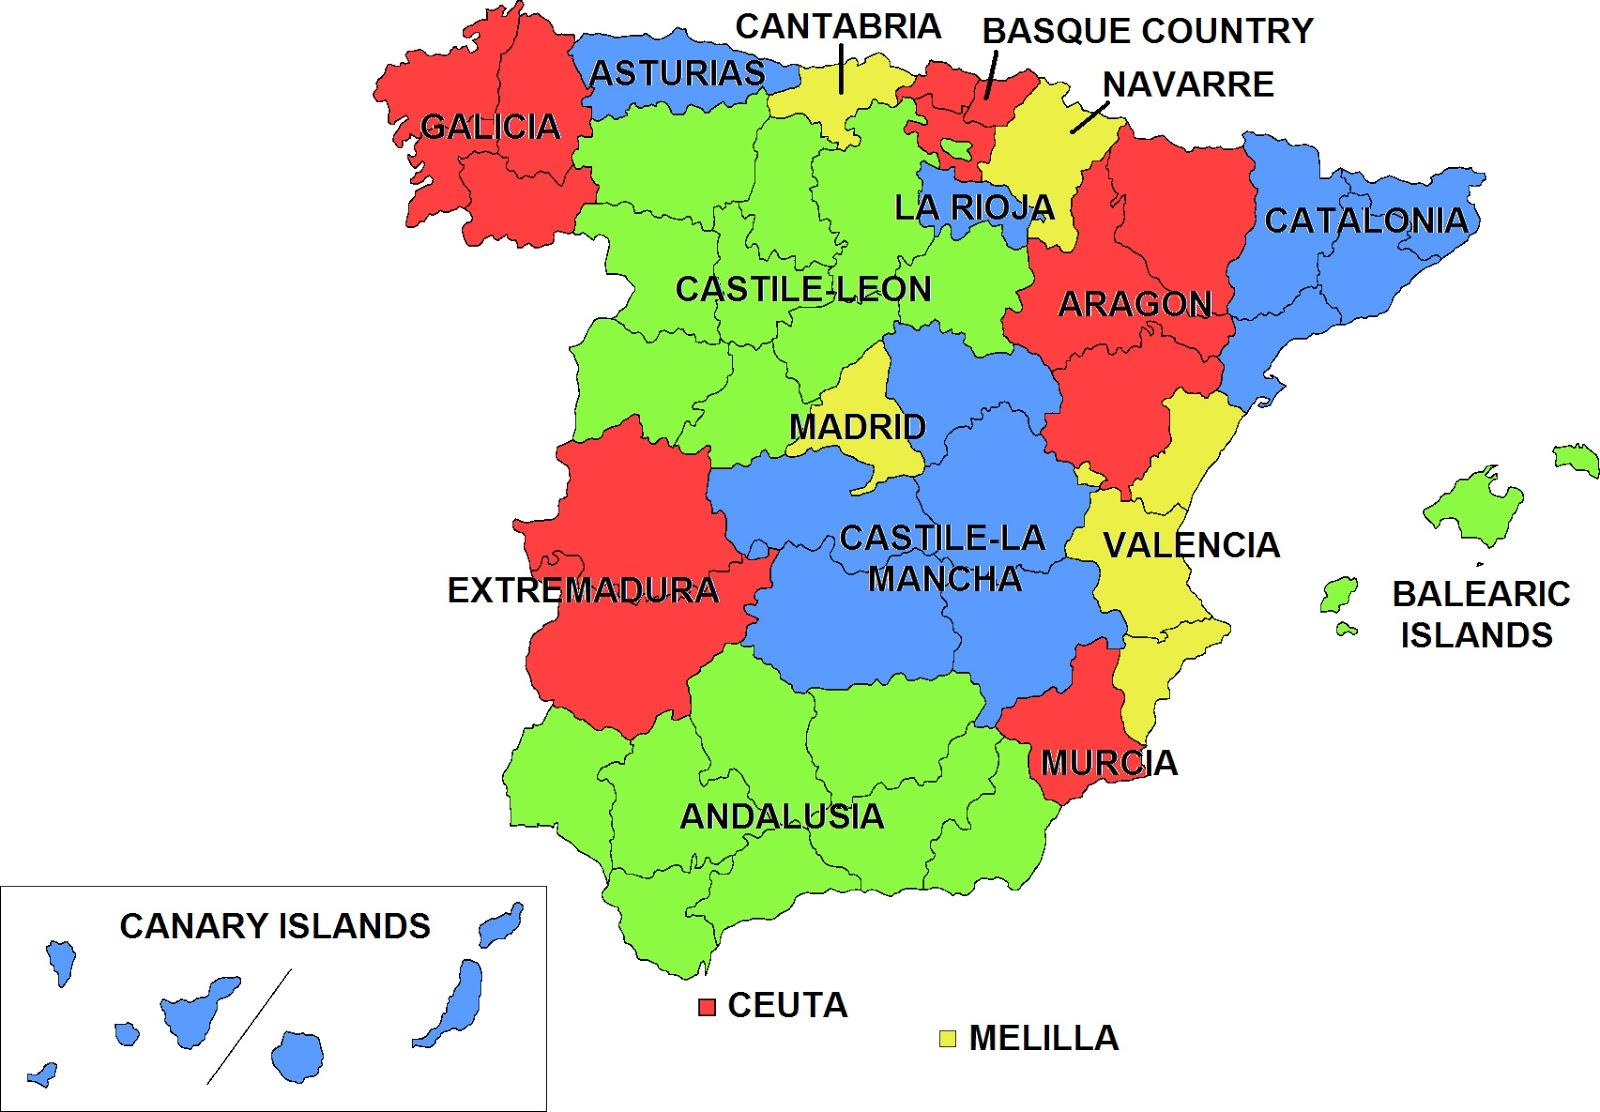 Spaniens Selvstyrende Regioner Kort Kort Over Spanien Autonome